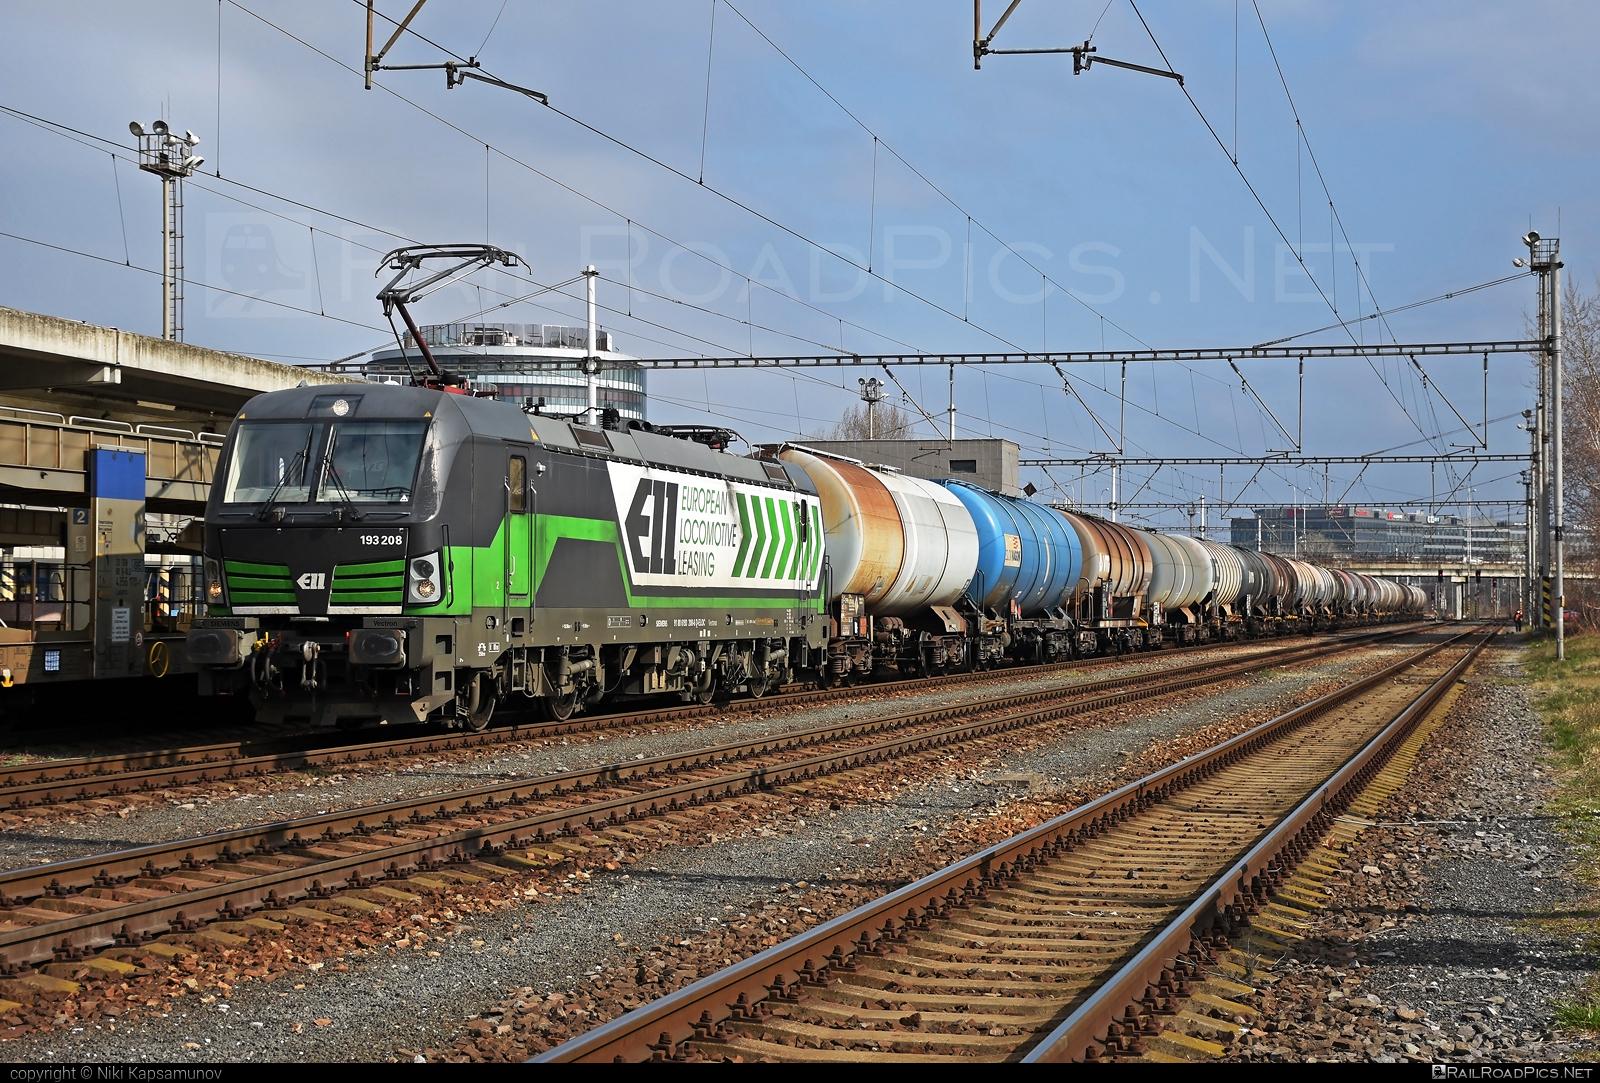 Siemens Vectron AC - 193 208 operated by FRACHTbahn Traktion GmbH #ell #ellgermany #eloc #europeanlocomotiveleasing #frachtbahn #frachtbahntraktion #frachtbahntraktiongmbh #kesselwagen #siemens #siemensvectron #siemensvectronac #tankwagon #vectron #vectronac